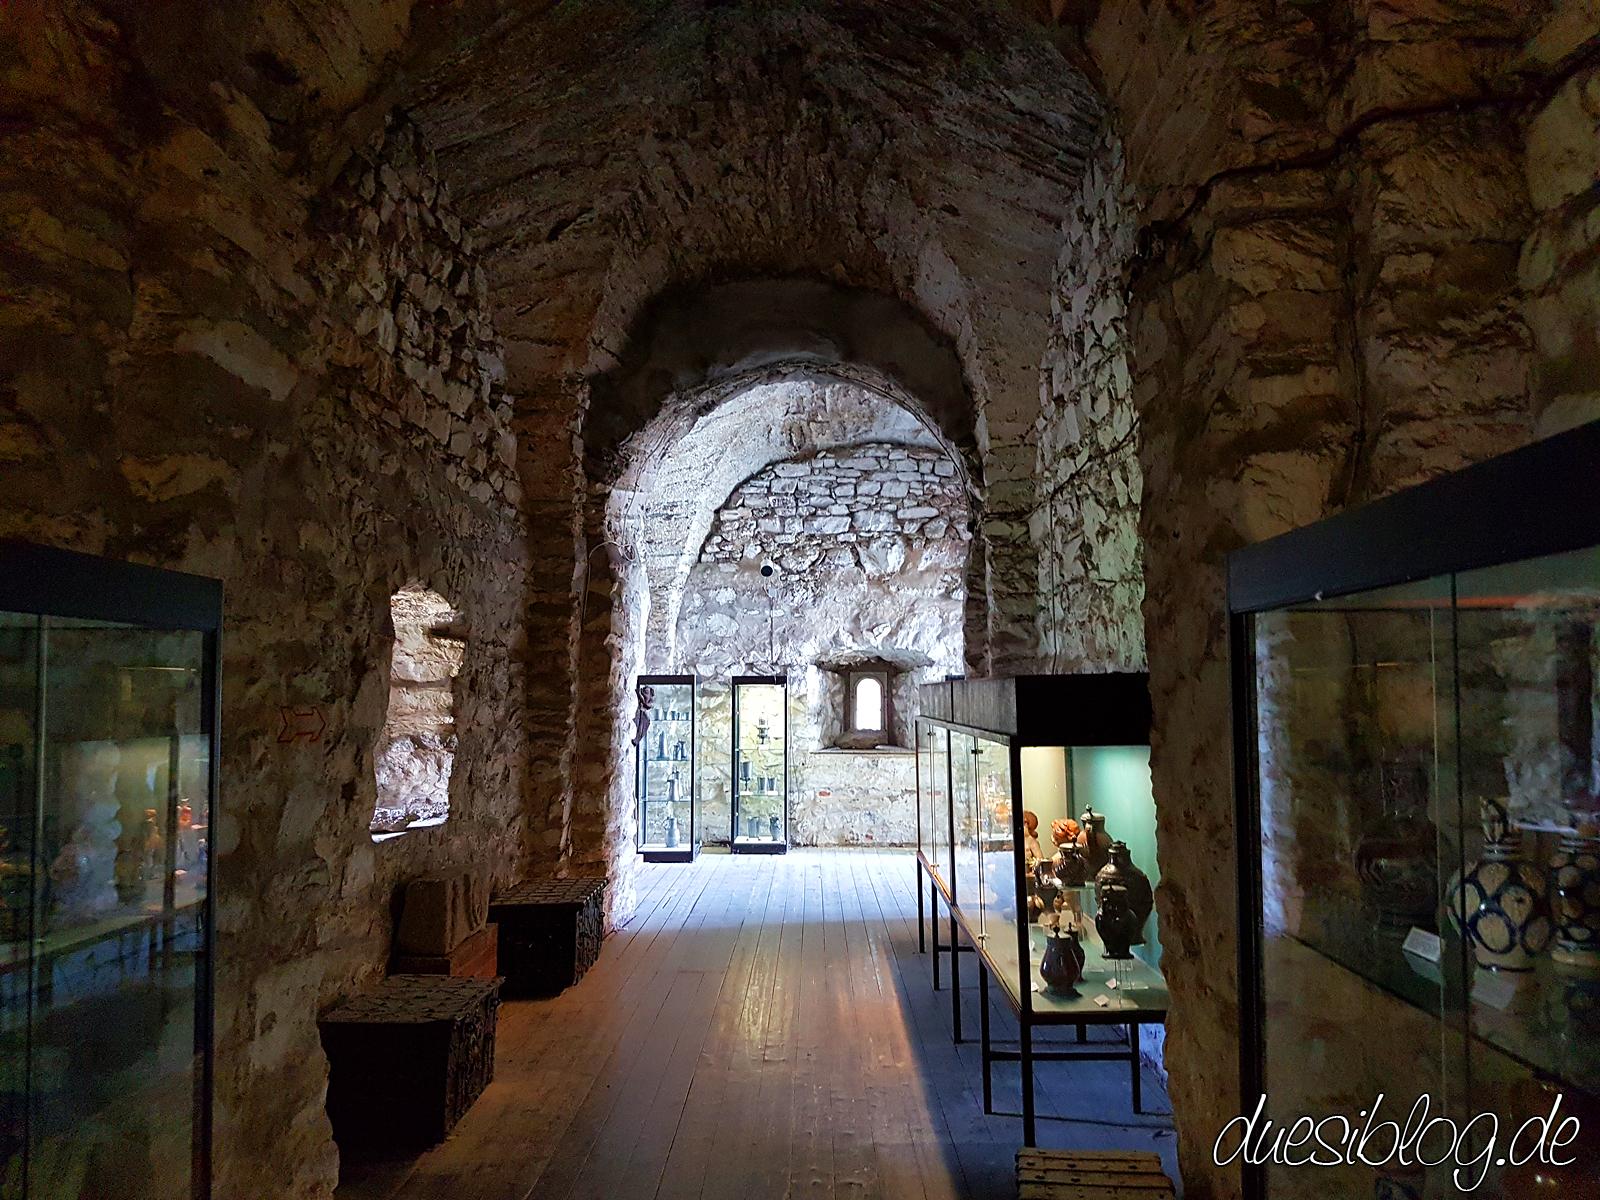 Ruedesheim Weinmuseum Broemserburg Rheingau Travelblog duesiblog 11